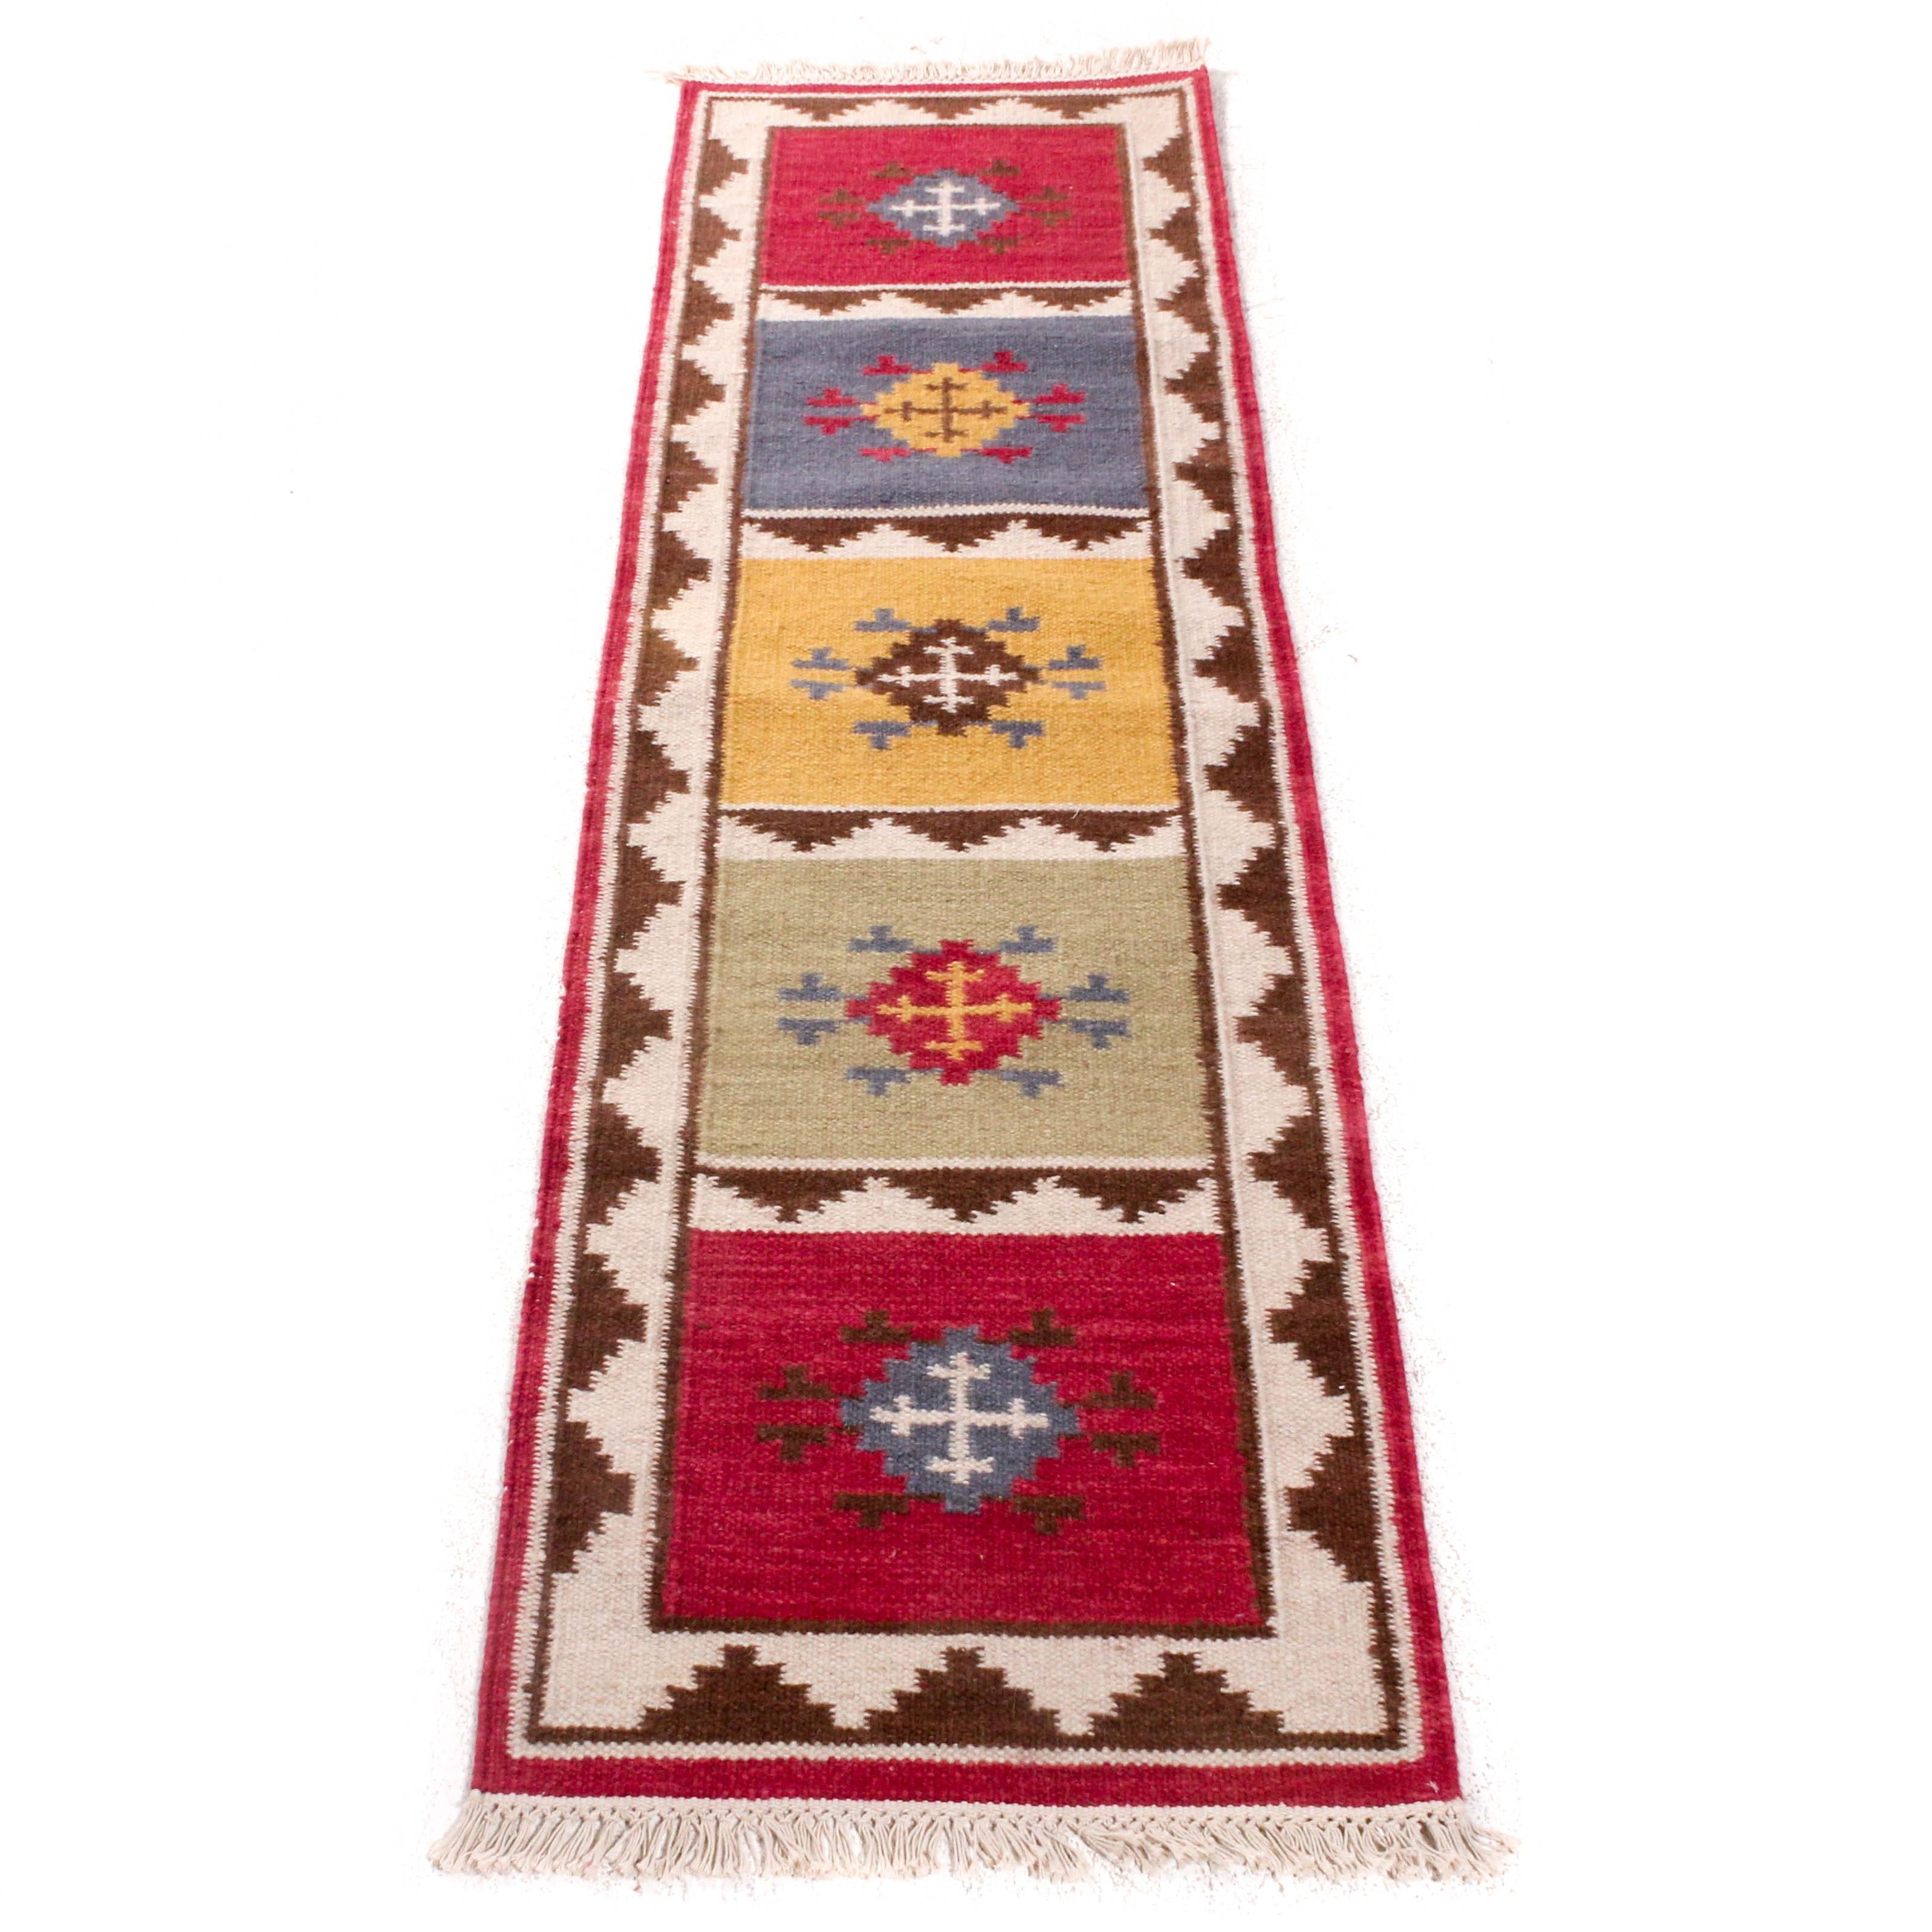 2'5 x 8'3 Hand-Knotted Indo-Turkish Wool Kilim Carpet Runner